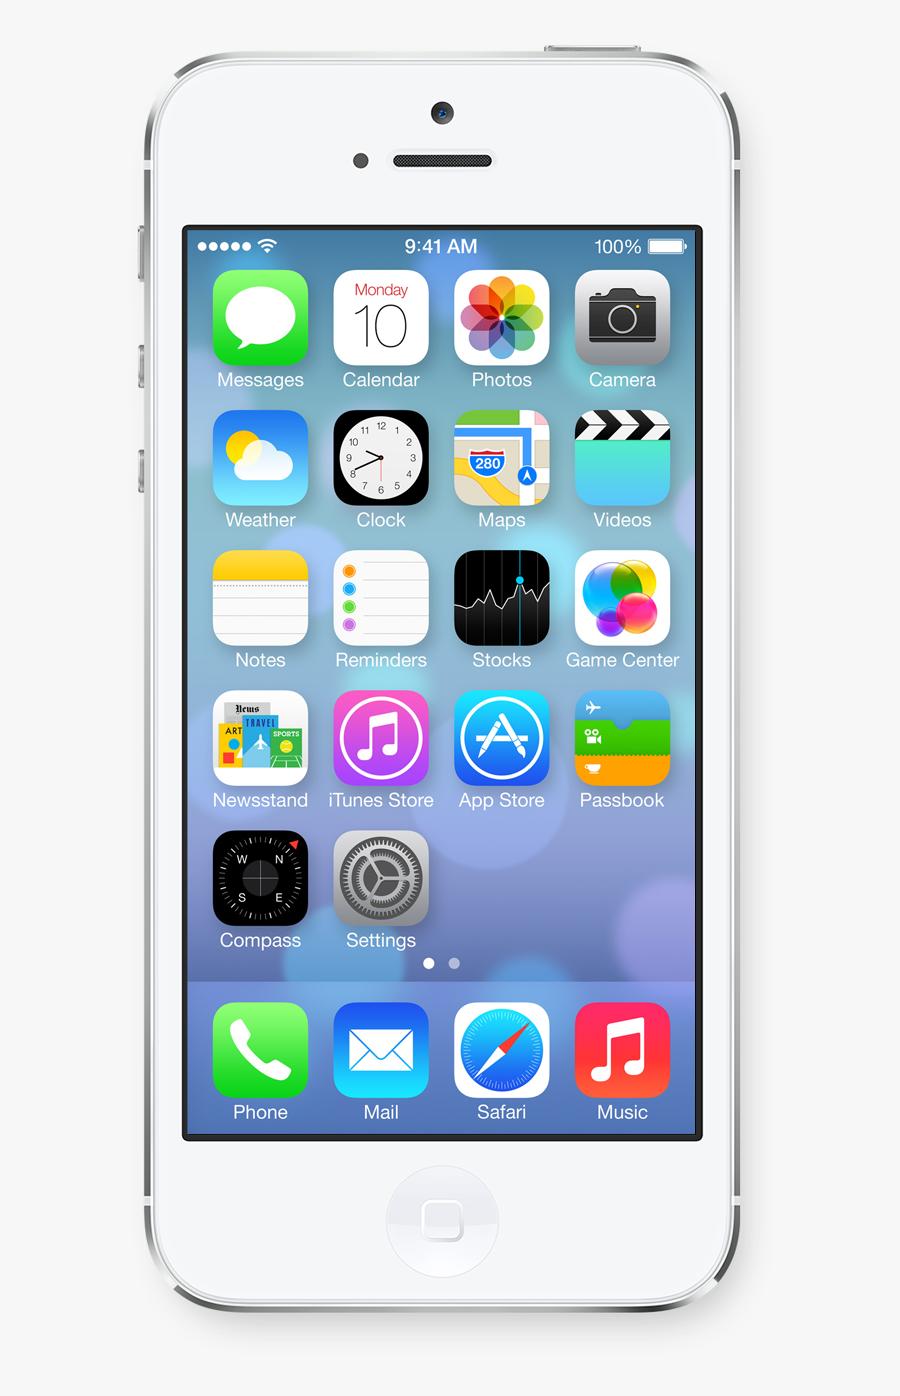 Apple Iphone 6, Transparent Clipart